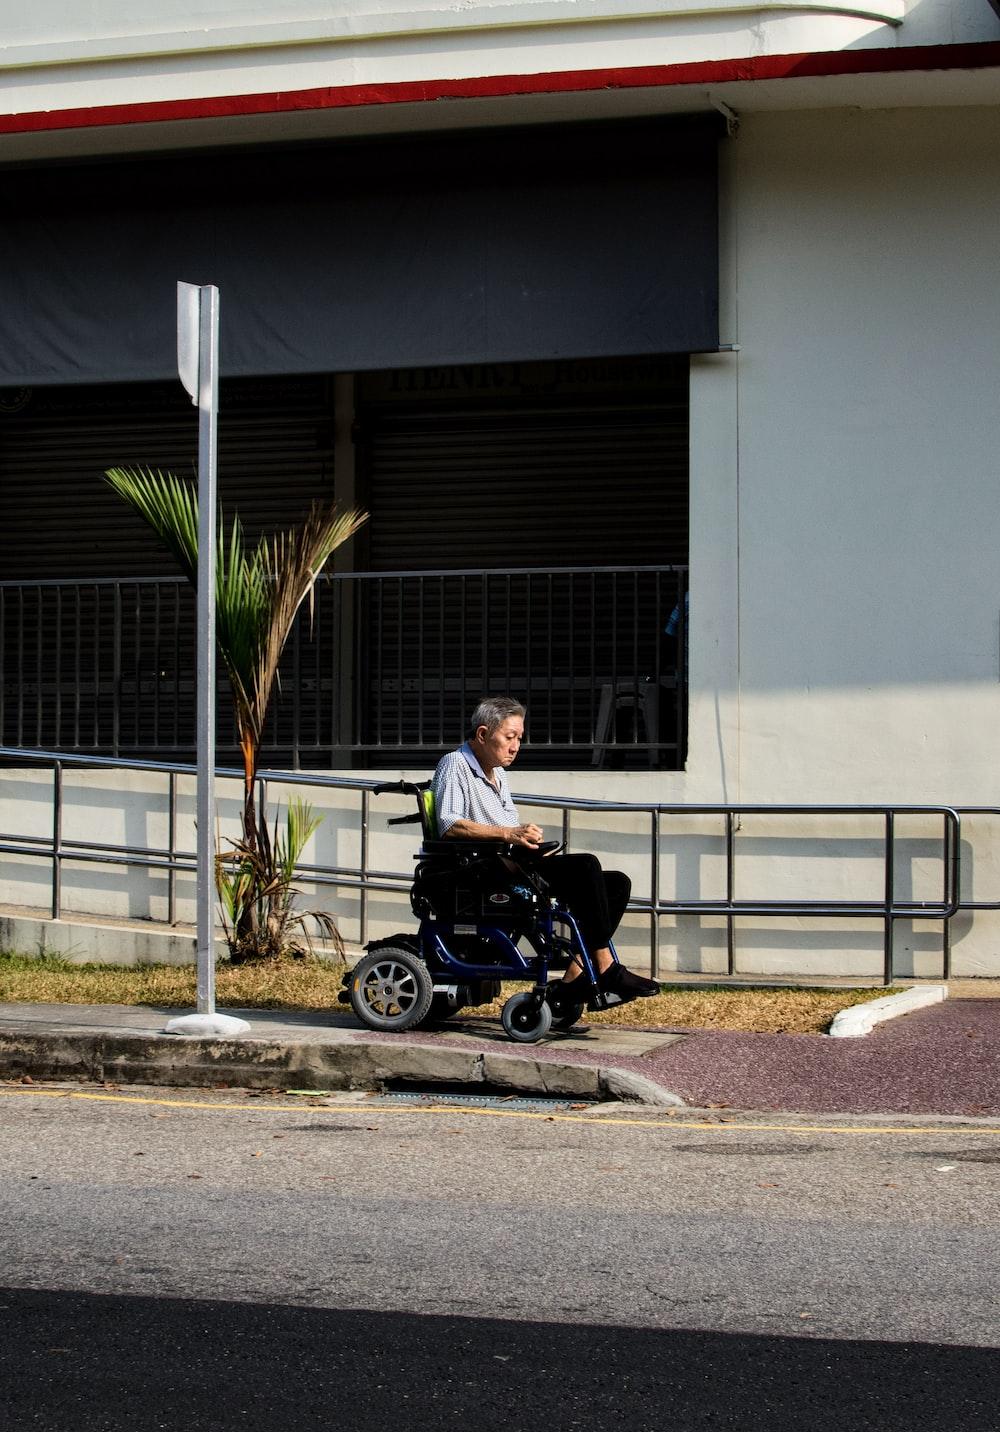 man riding wheelchair at roadside during daytime